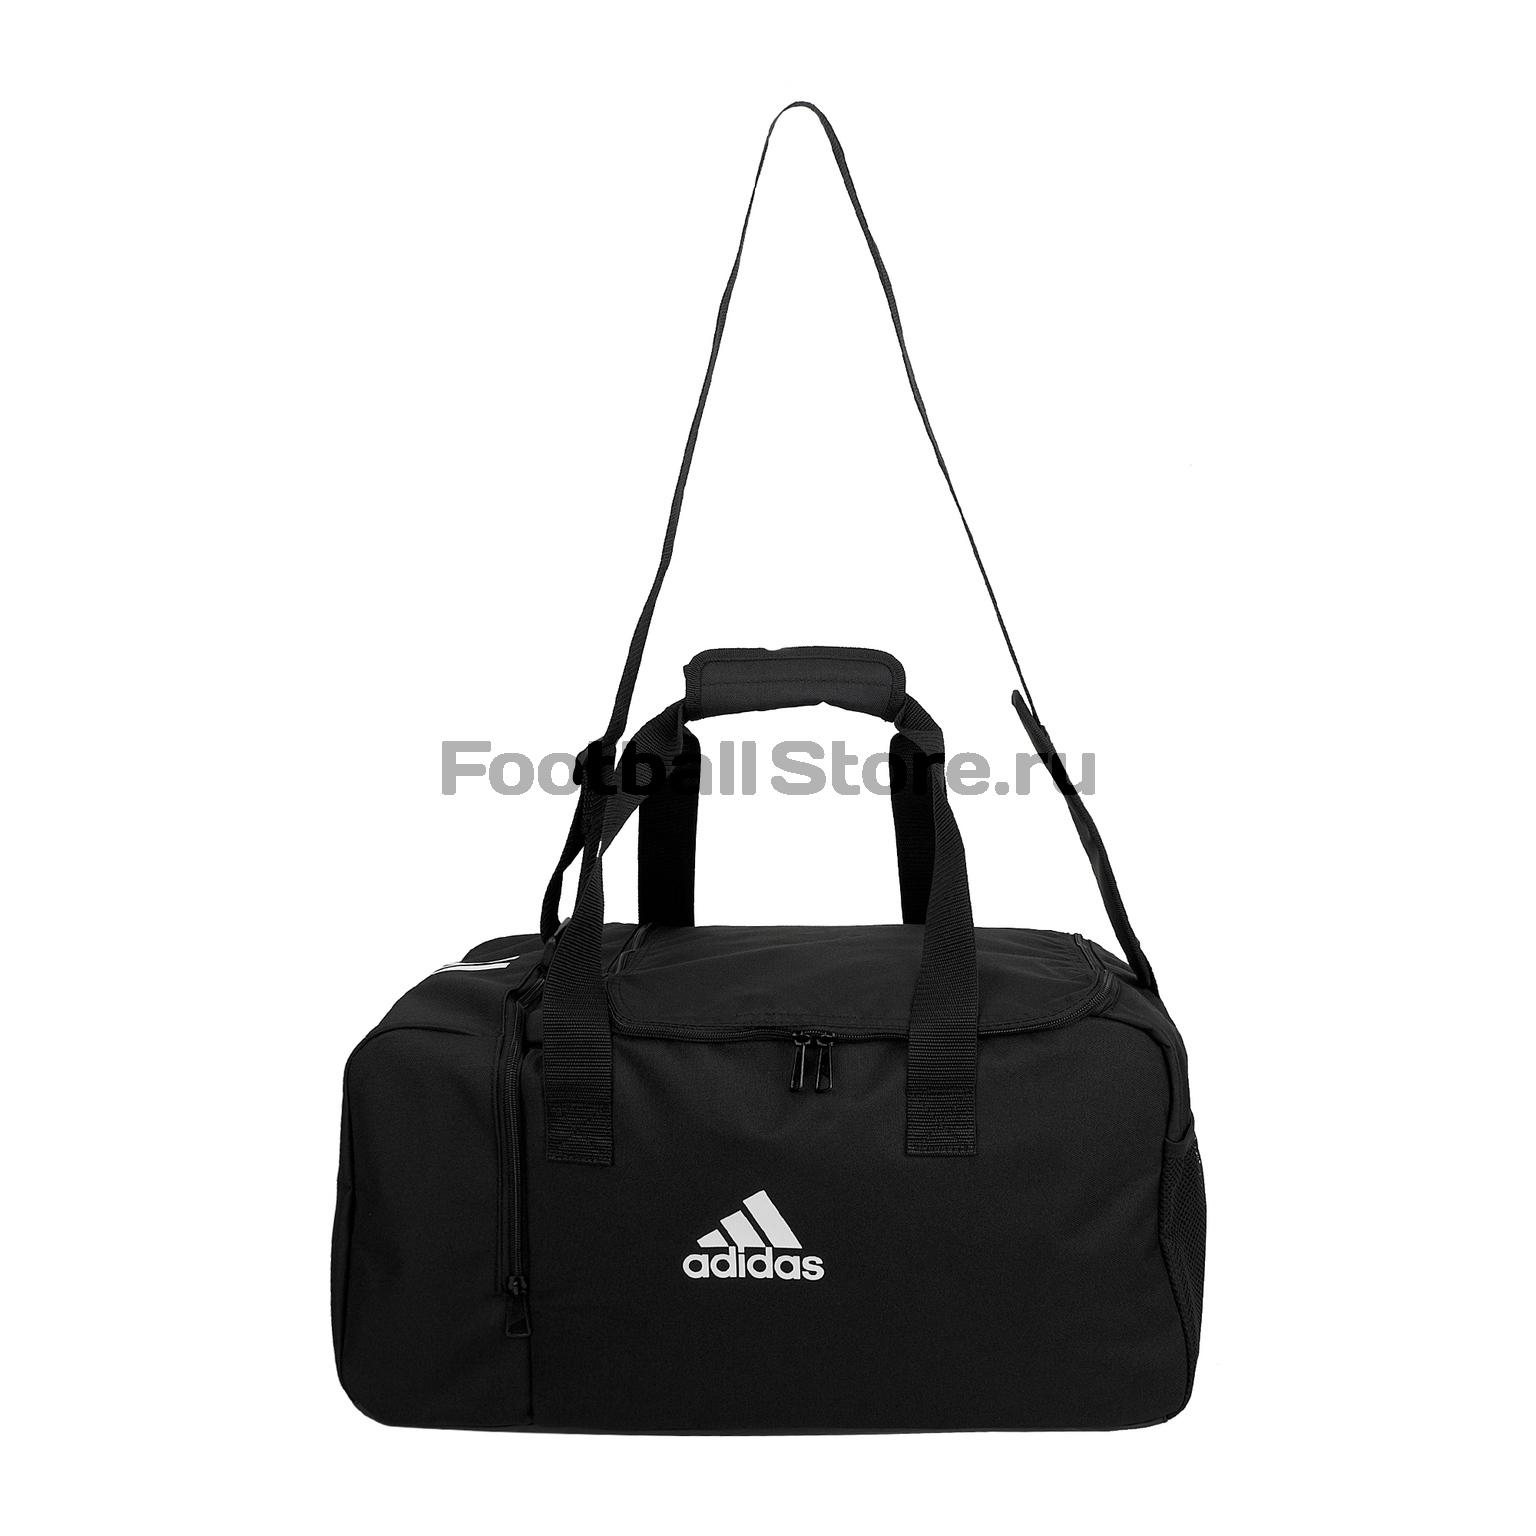 Сумка Adidas Tiro S DQ1075 сумка adidas tiro tb l bs4743